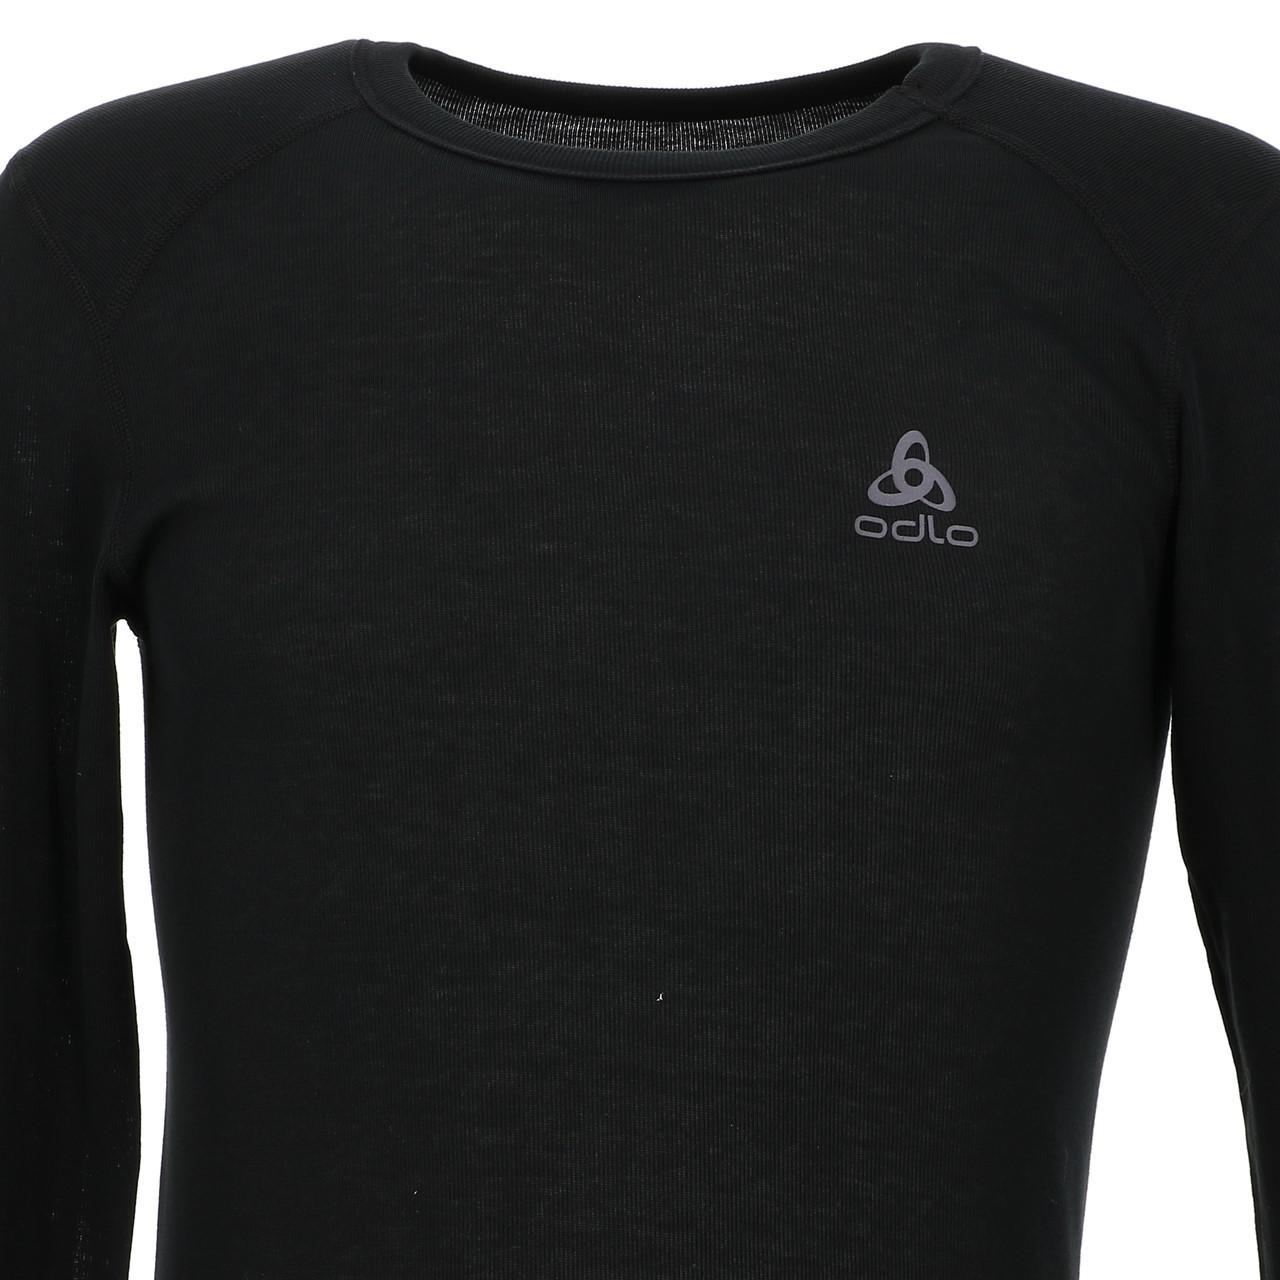 Under-Clothing-Thermal-Hot-Odlo-Warm-Black-DRC-ML-Tee-Black-85353-New thumbnail 2